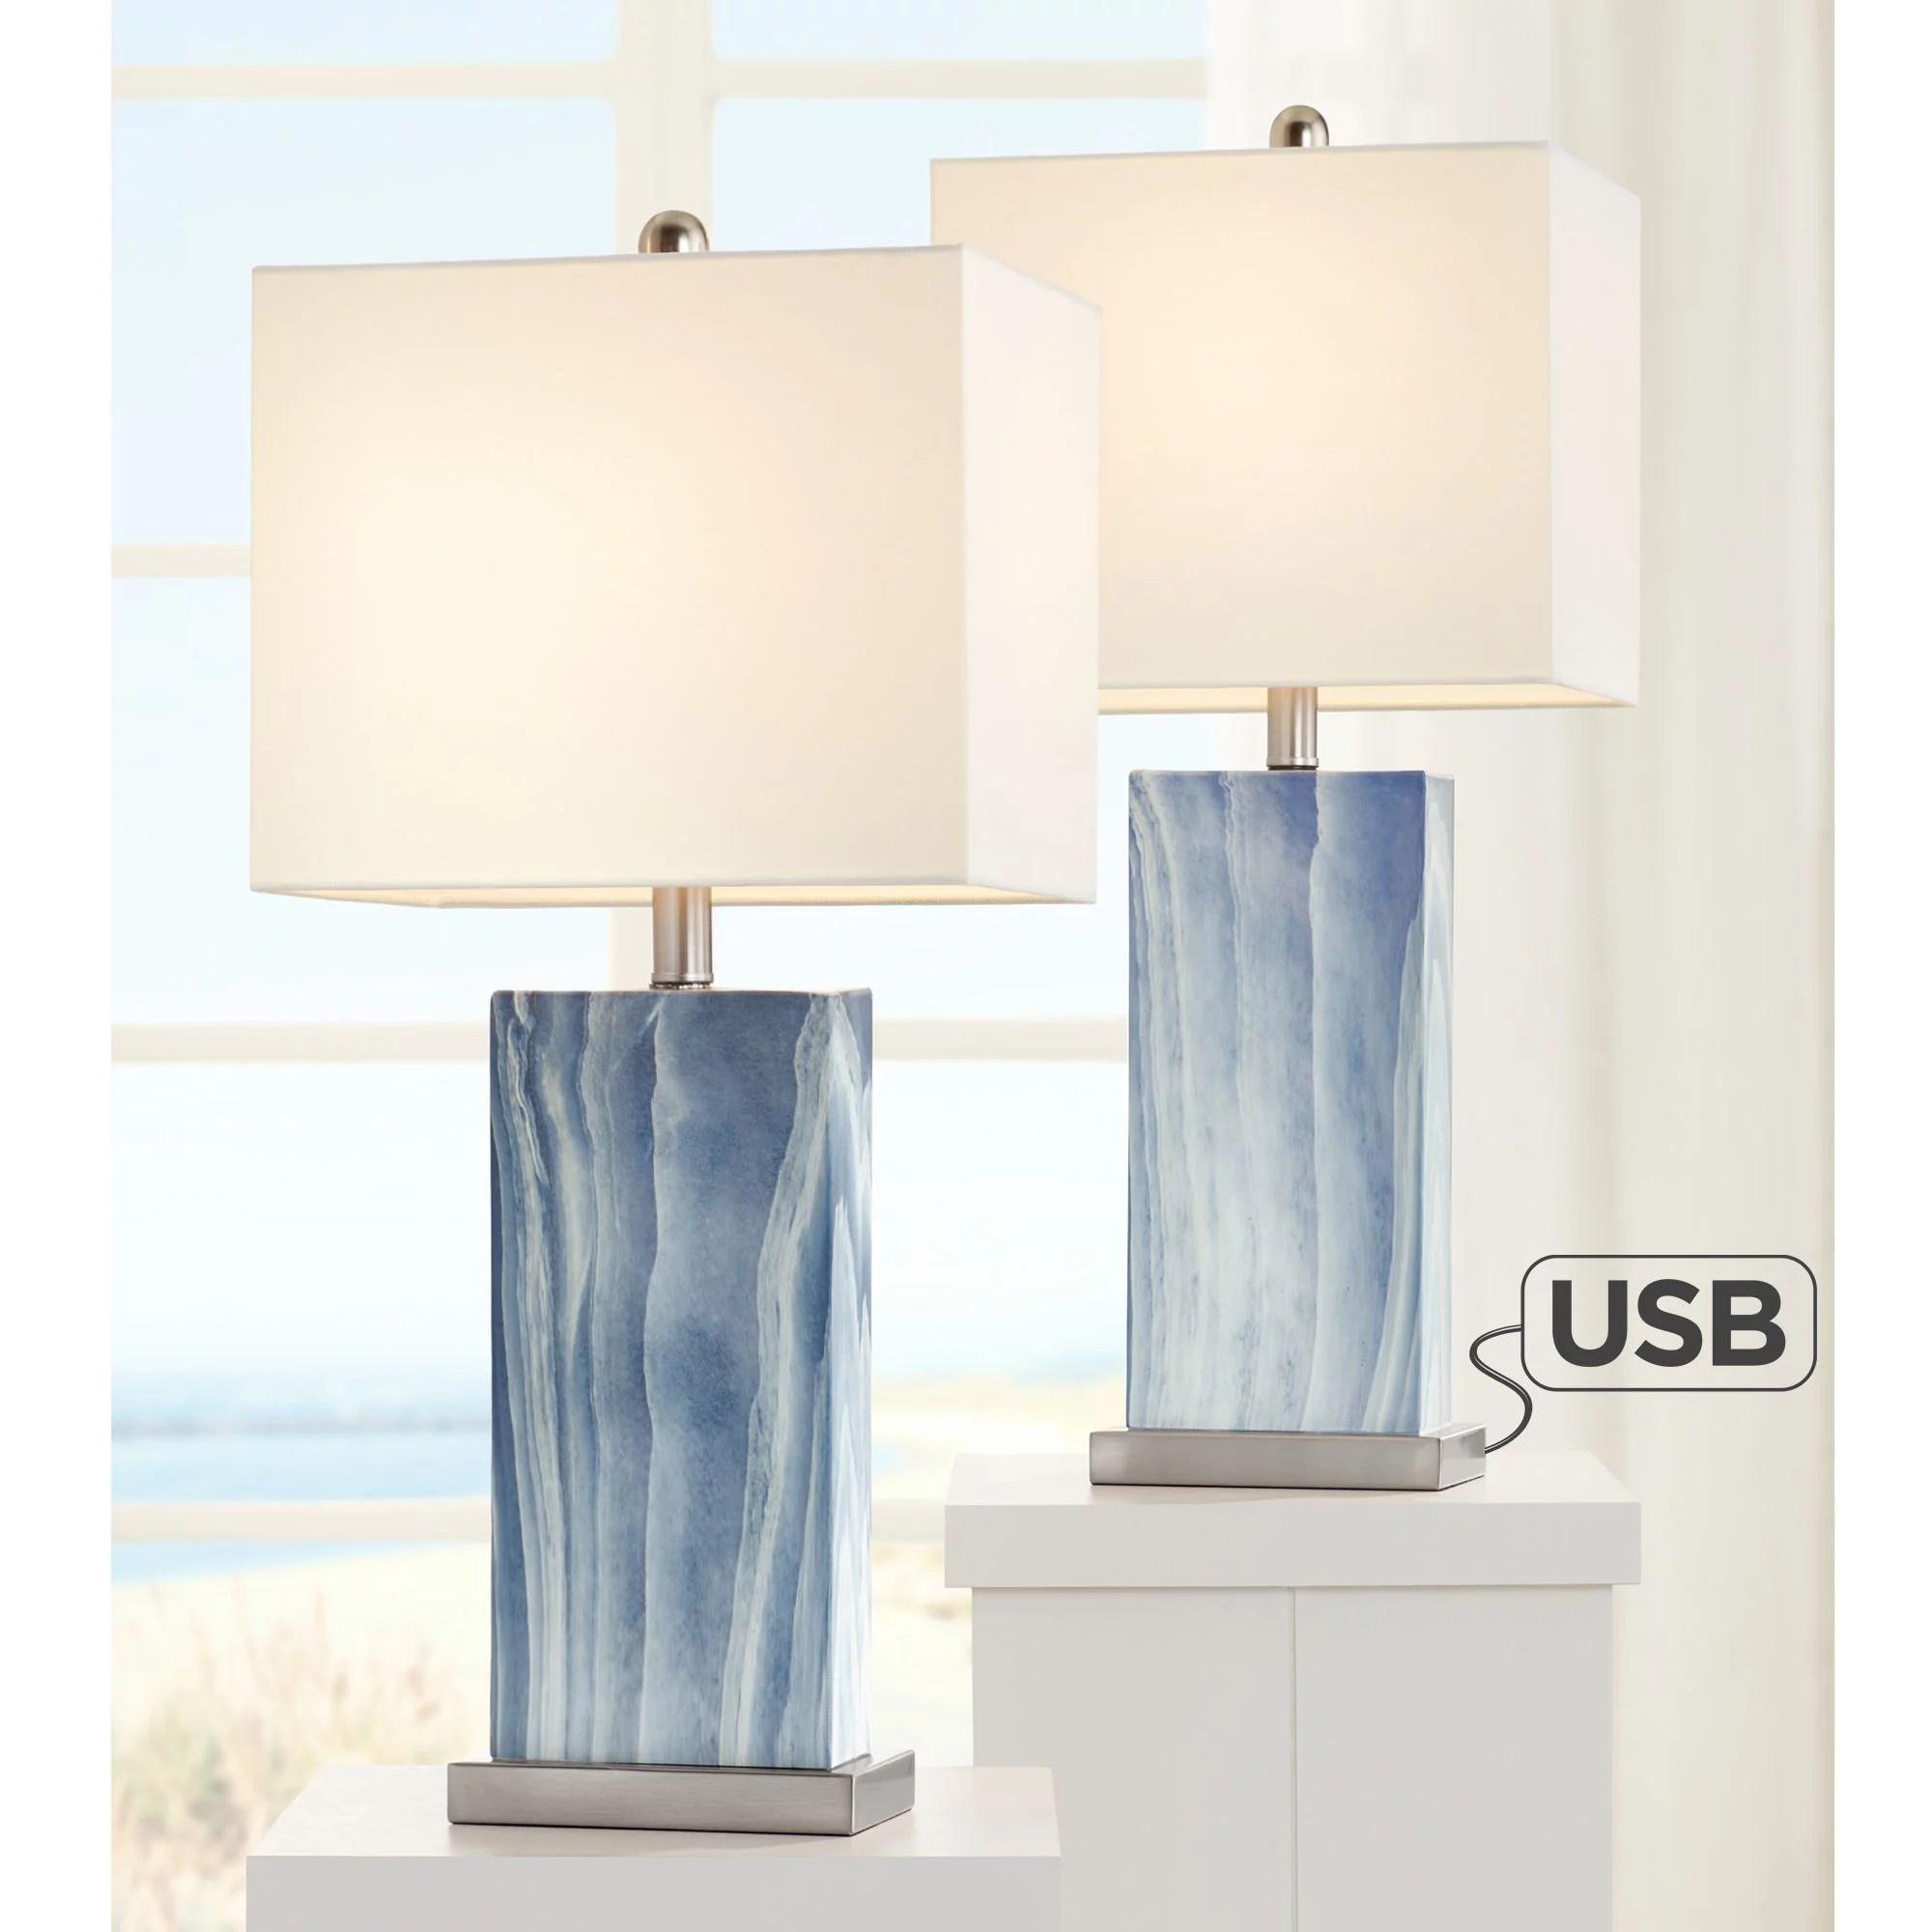 360 Lighting Modern Table Lamps Set Of 2 With Usb Charging Port Rectangular Blue White Fabric Shade Living Room Bedroom Bedside Walmart Com Walmart Com